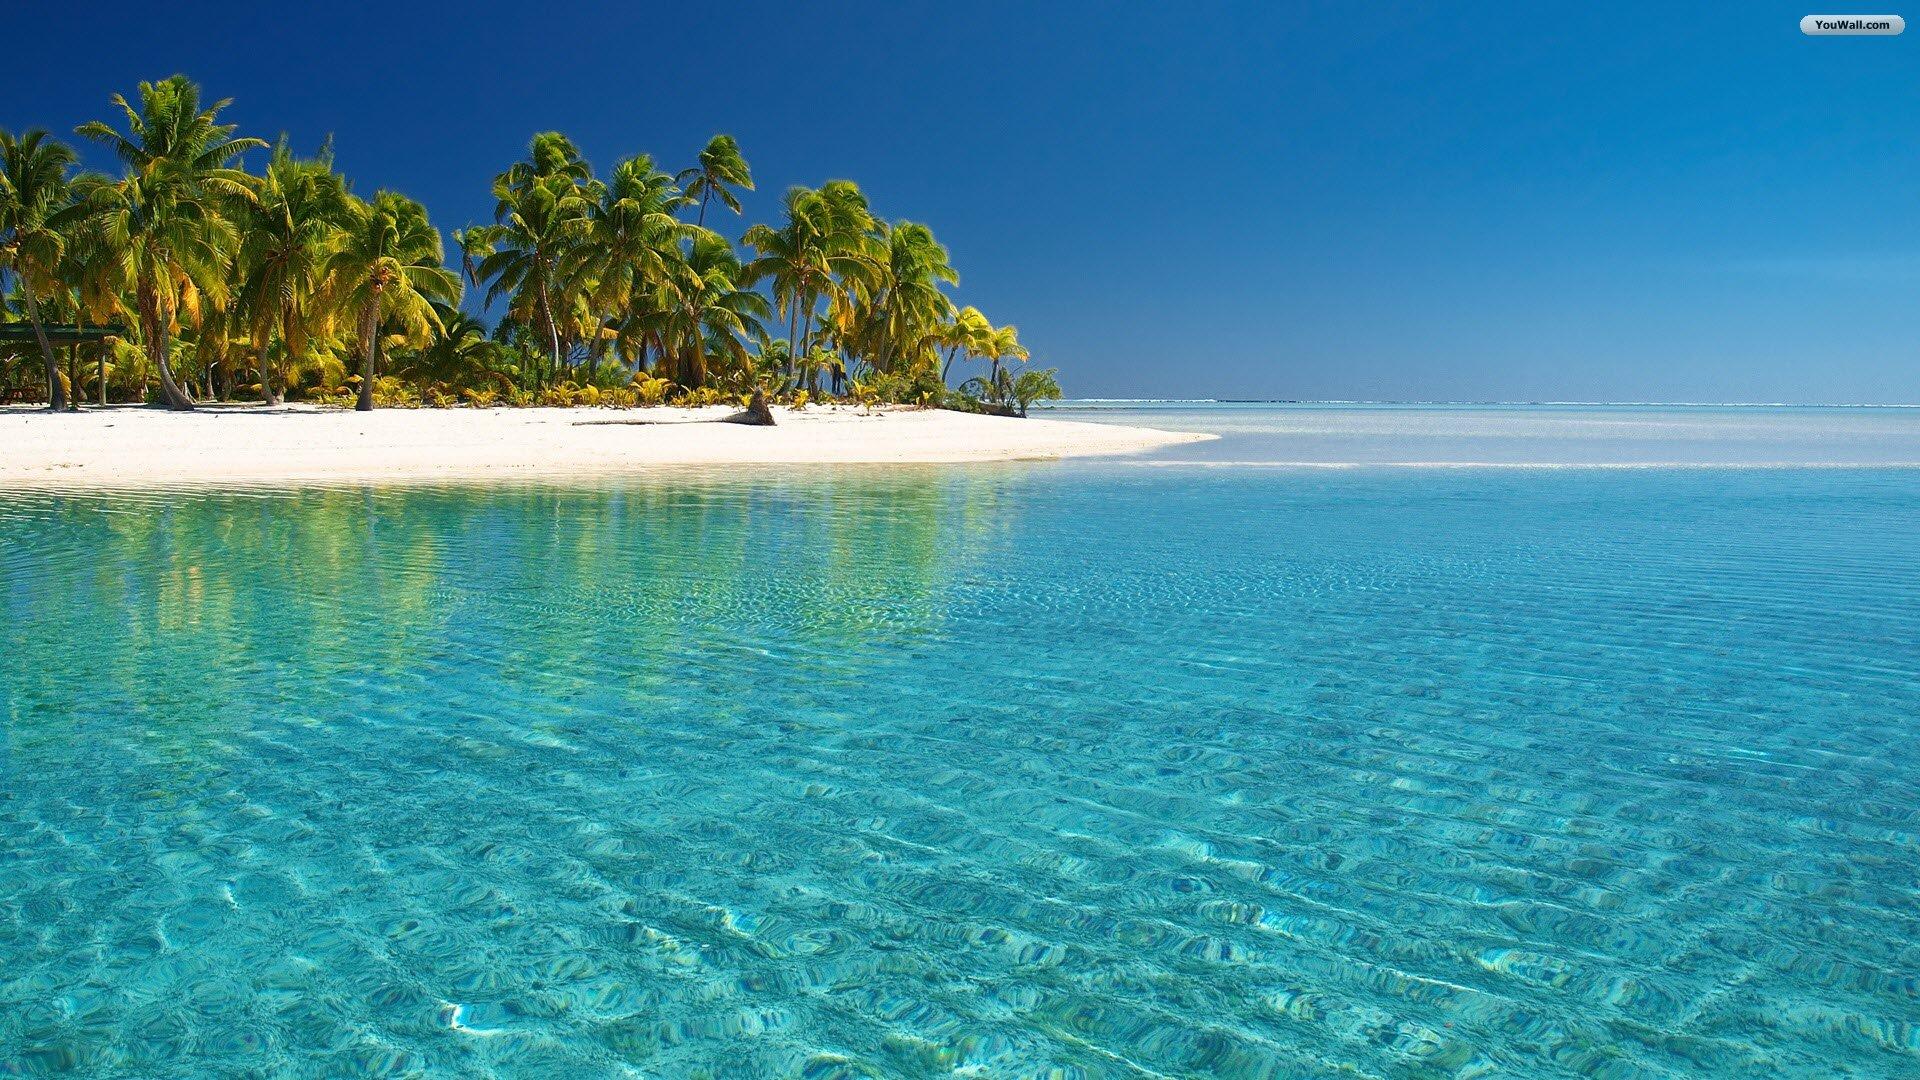 Tropical Island Beaches - Download Wallpaper Free